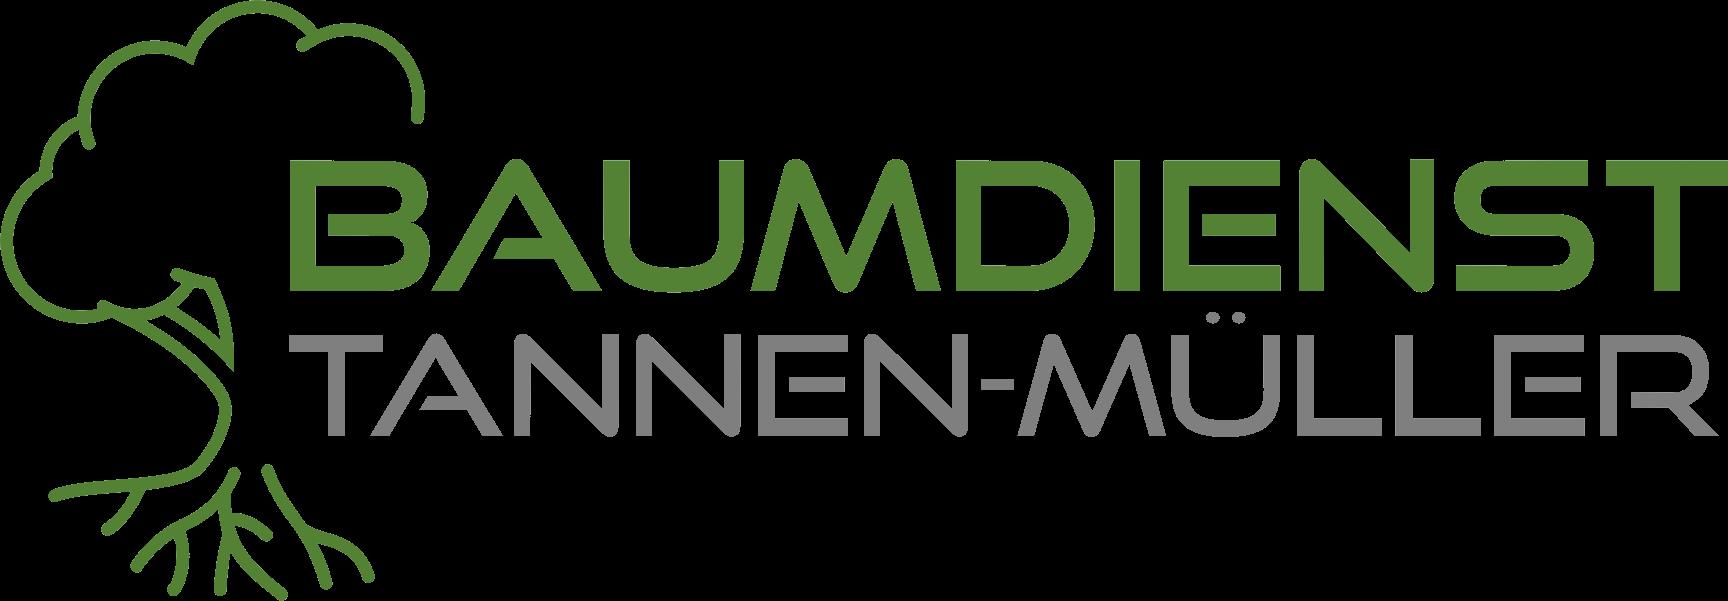 Tannen-Müller GmbH